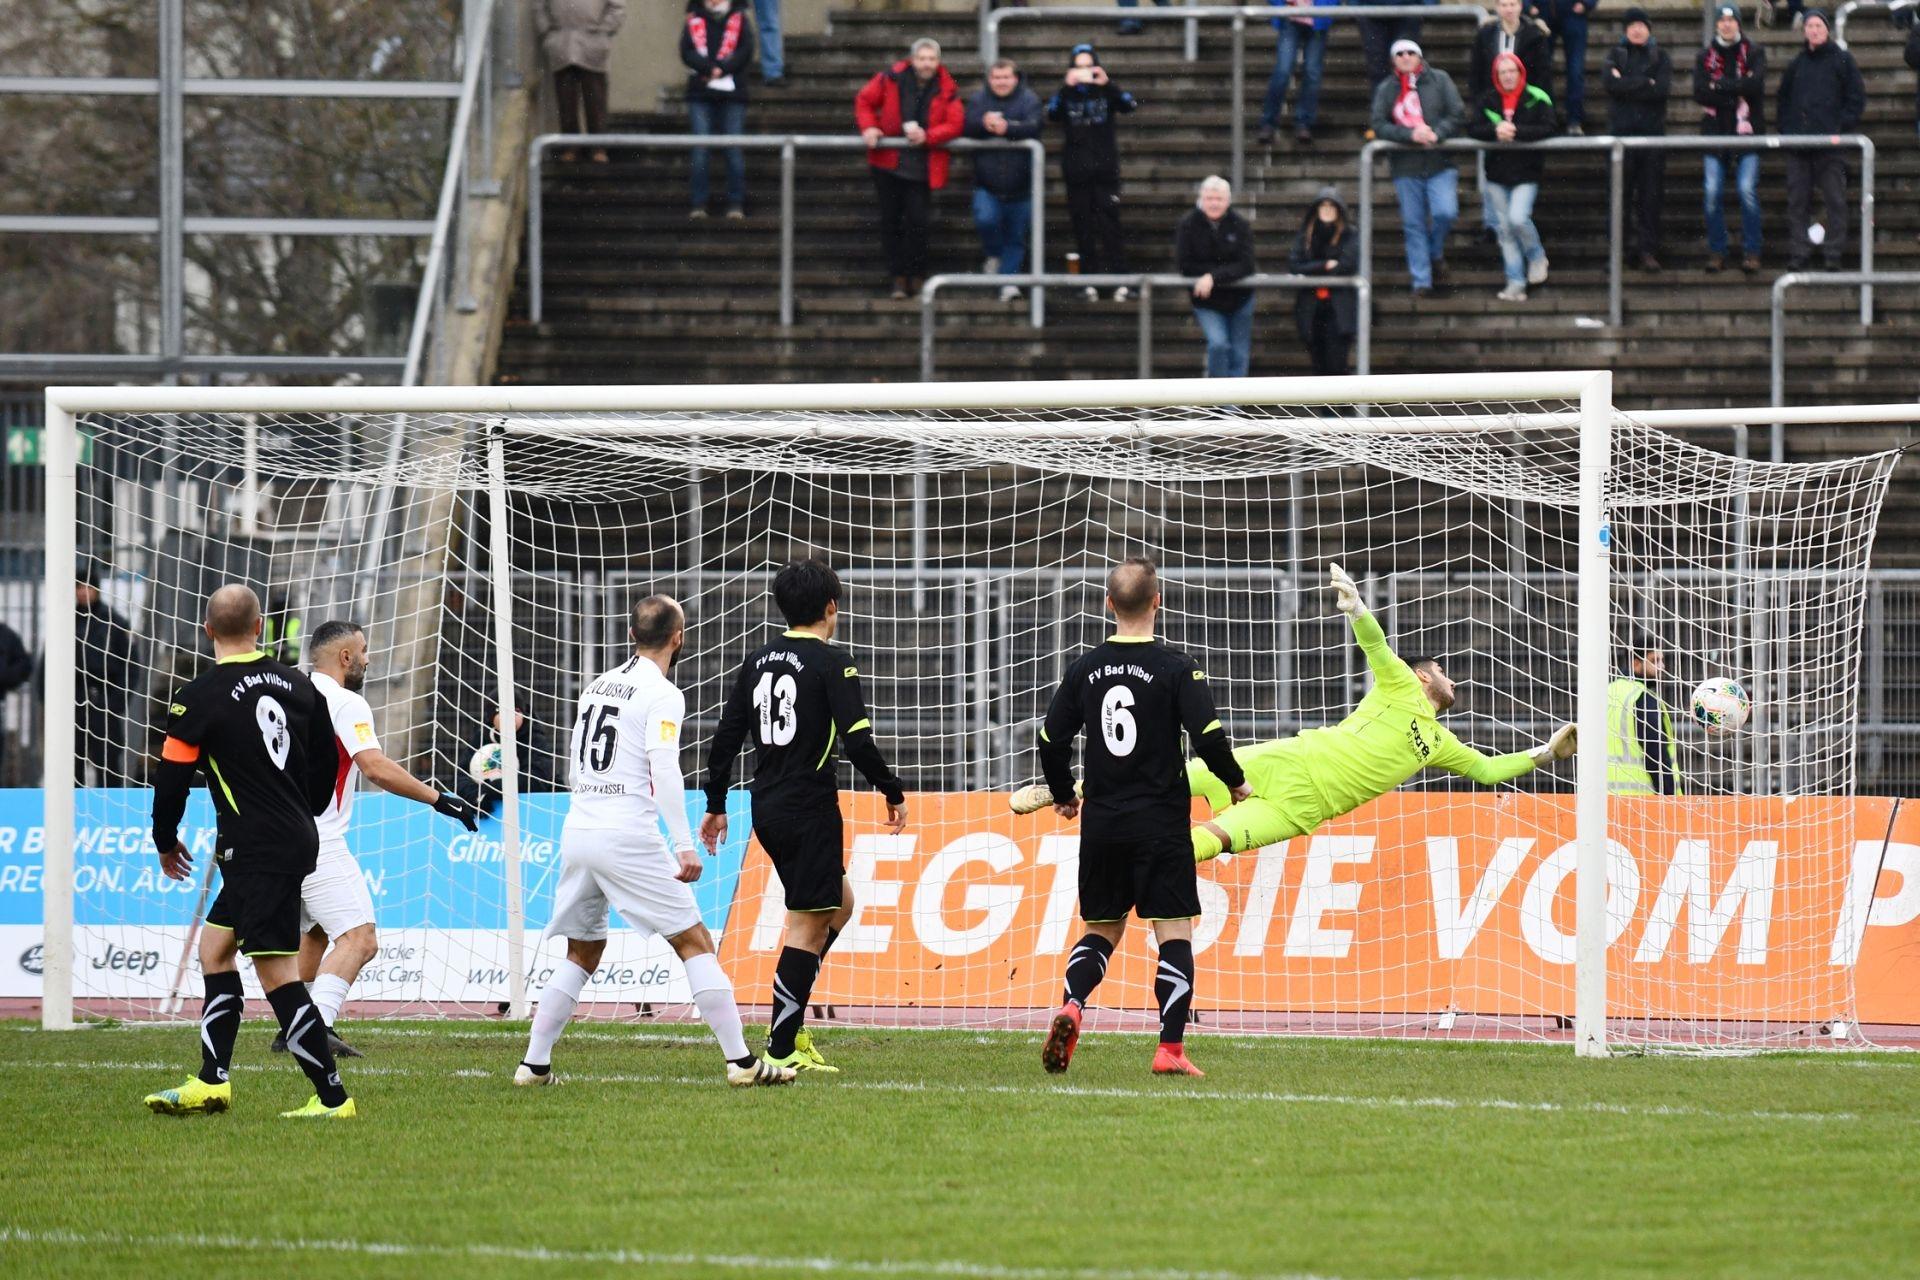 Lotto Hessenliga 2019/2020, KSV Hessen Kassel, FV Bad Vilbel, Endstand 6:1, Tor zum 1:0, Mahir Saglik (KSV Hessen Kassel), Sergej Evljuskin (KSV Hessen Kassel)